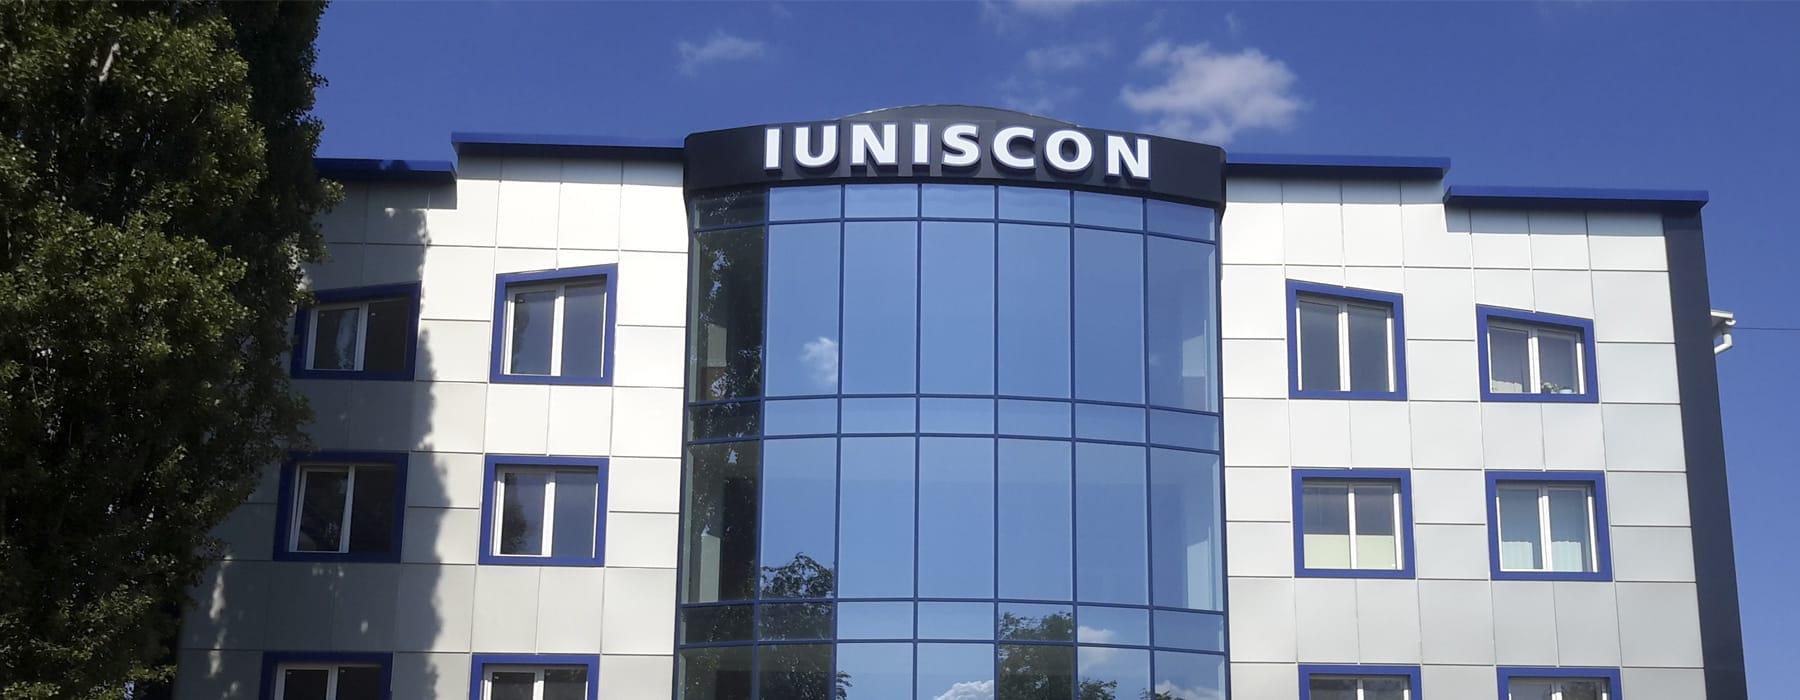 iuniscon